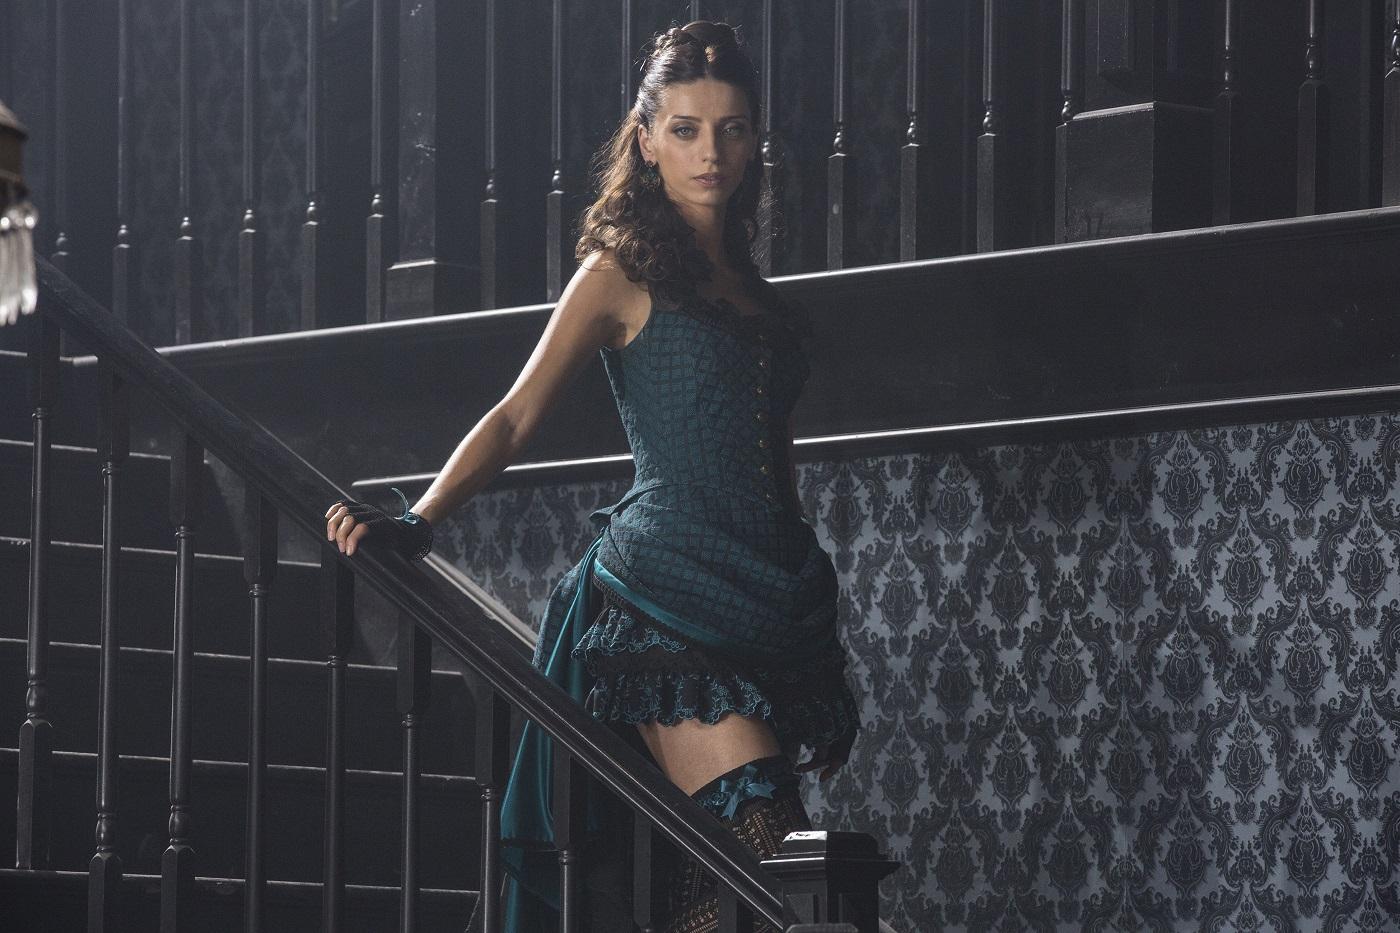 Angela Sarafyan as Clementine Pennyfeather on Westworld